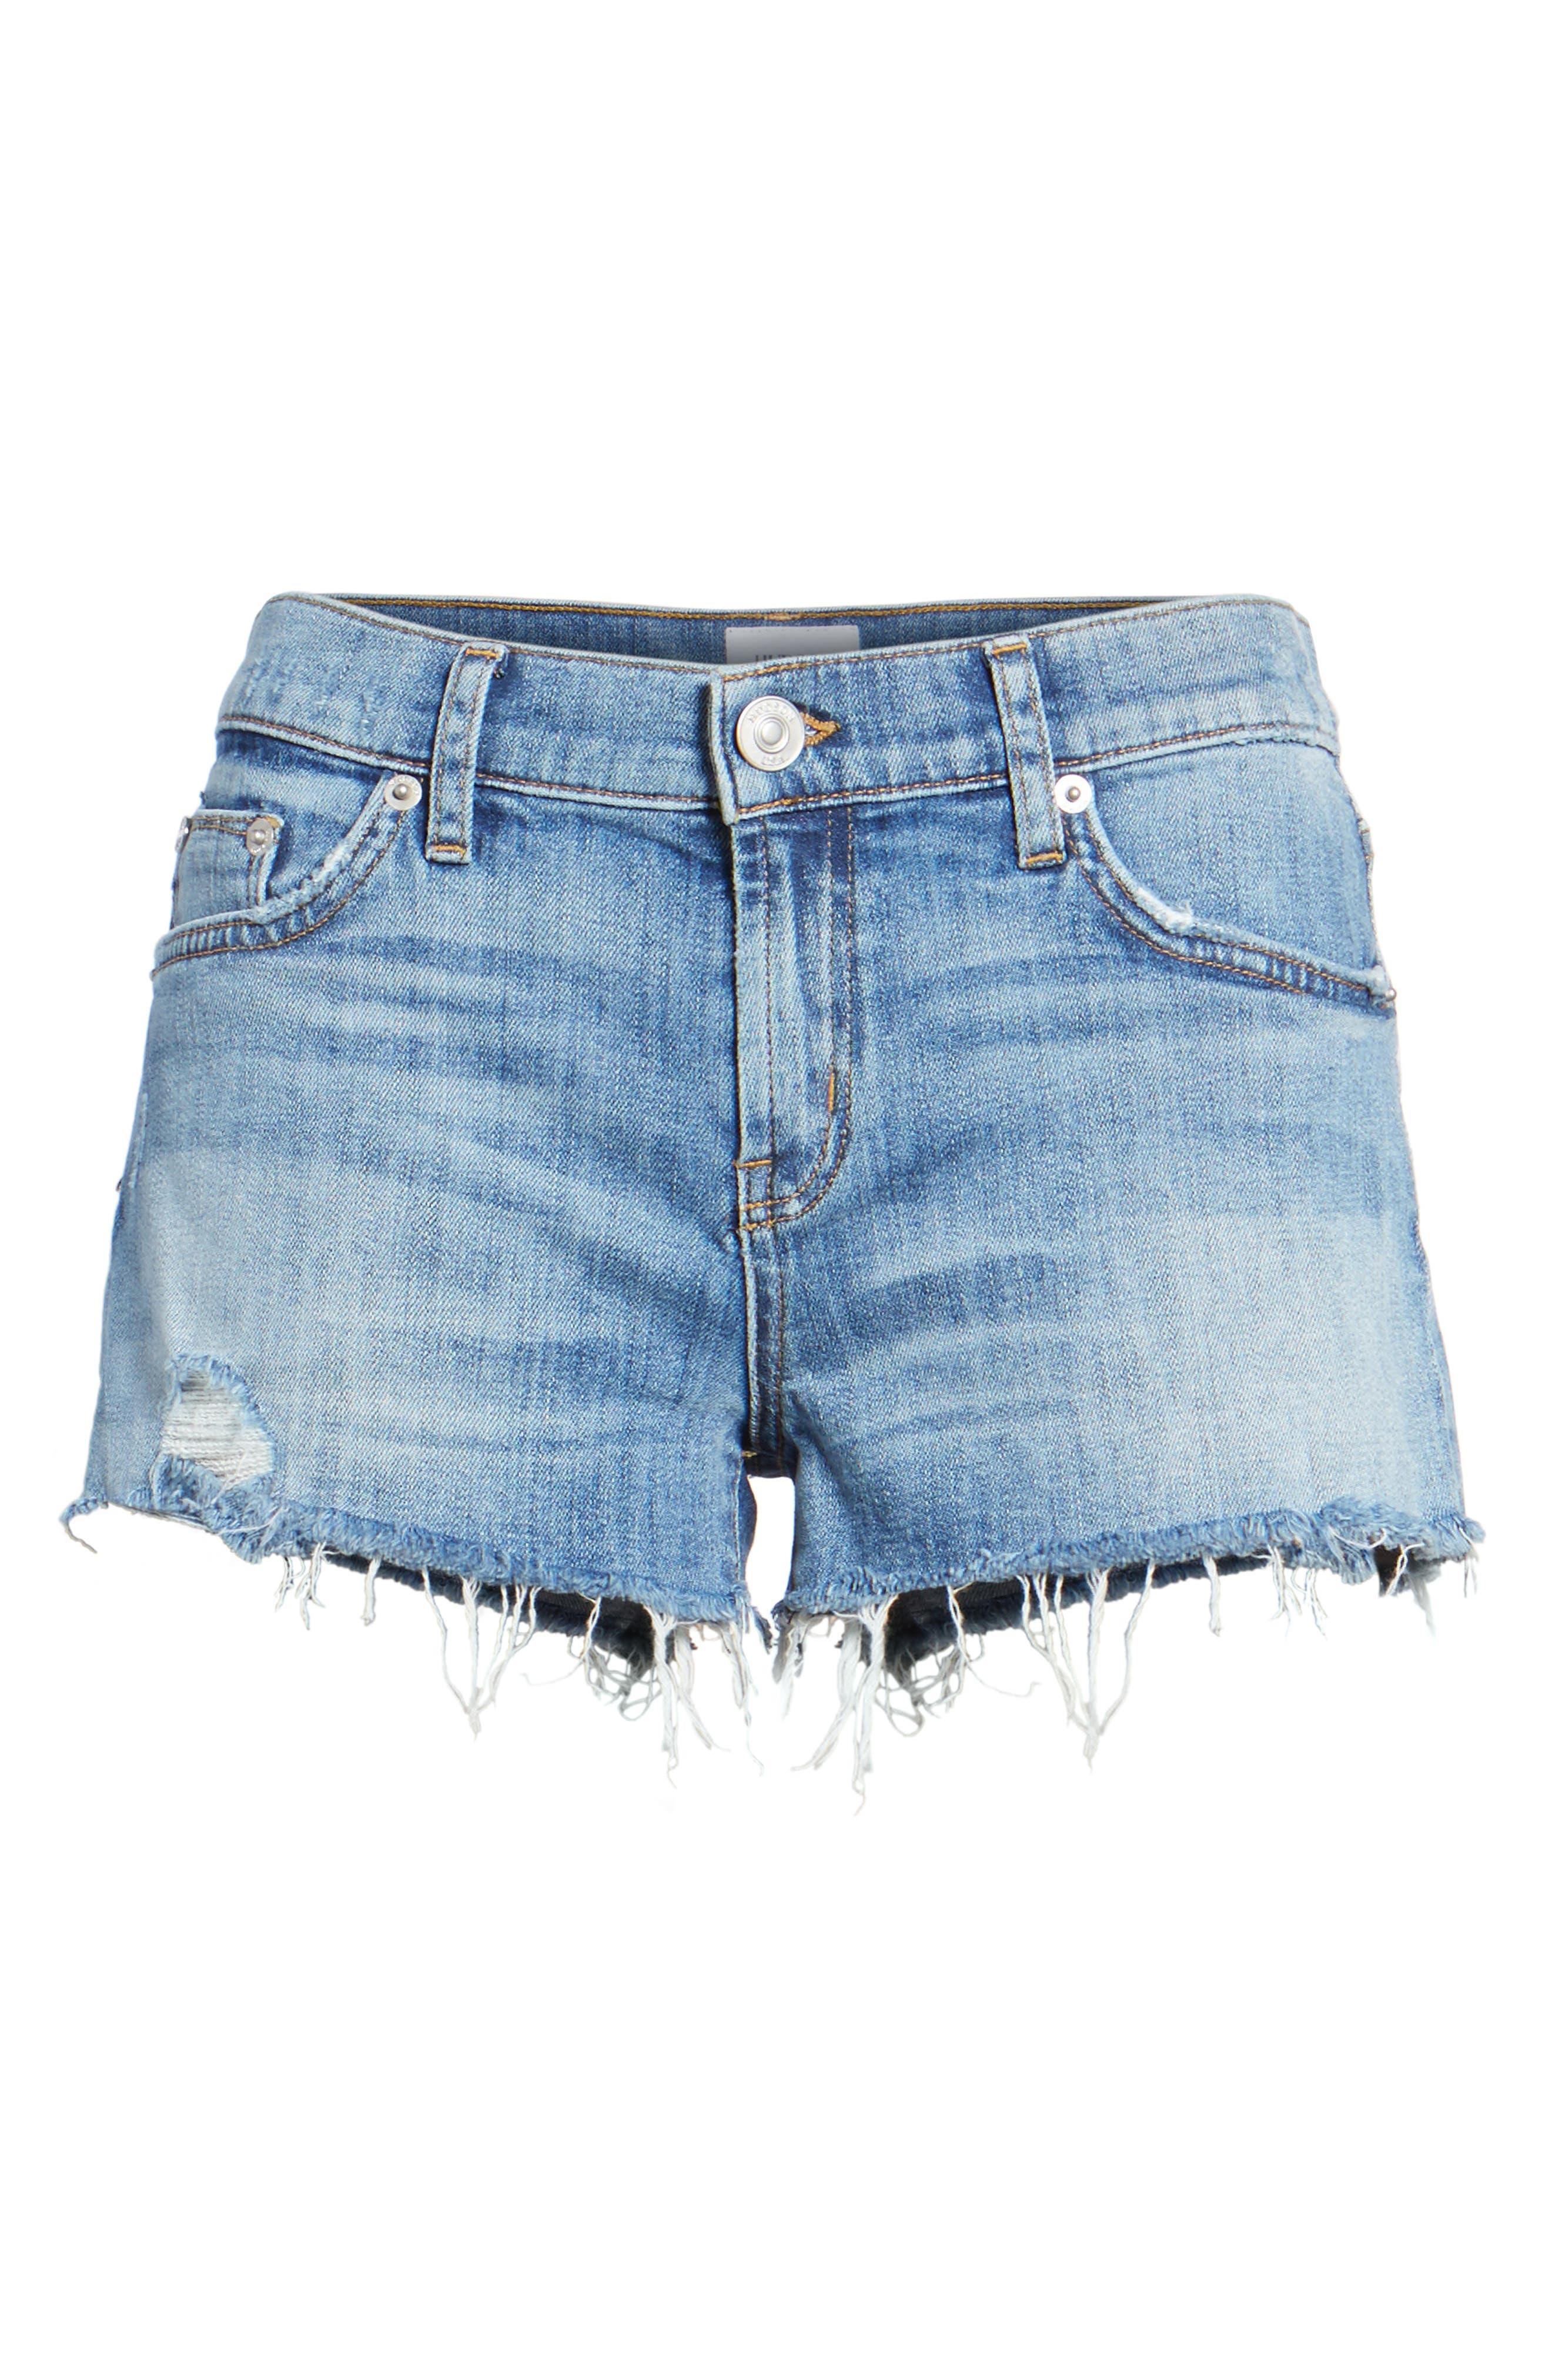 Kenzie Cutoff Denim Shorts,                             Alternate thumbnail 7, color,                             420